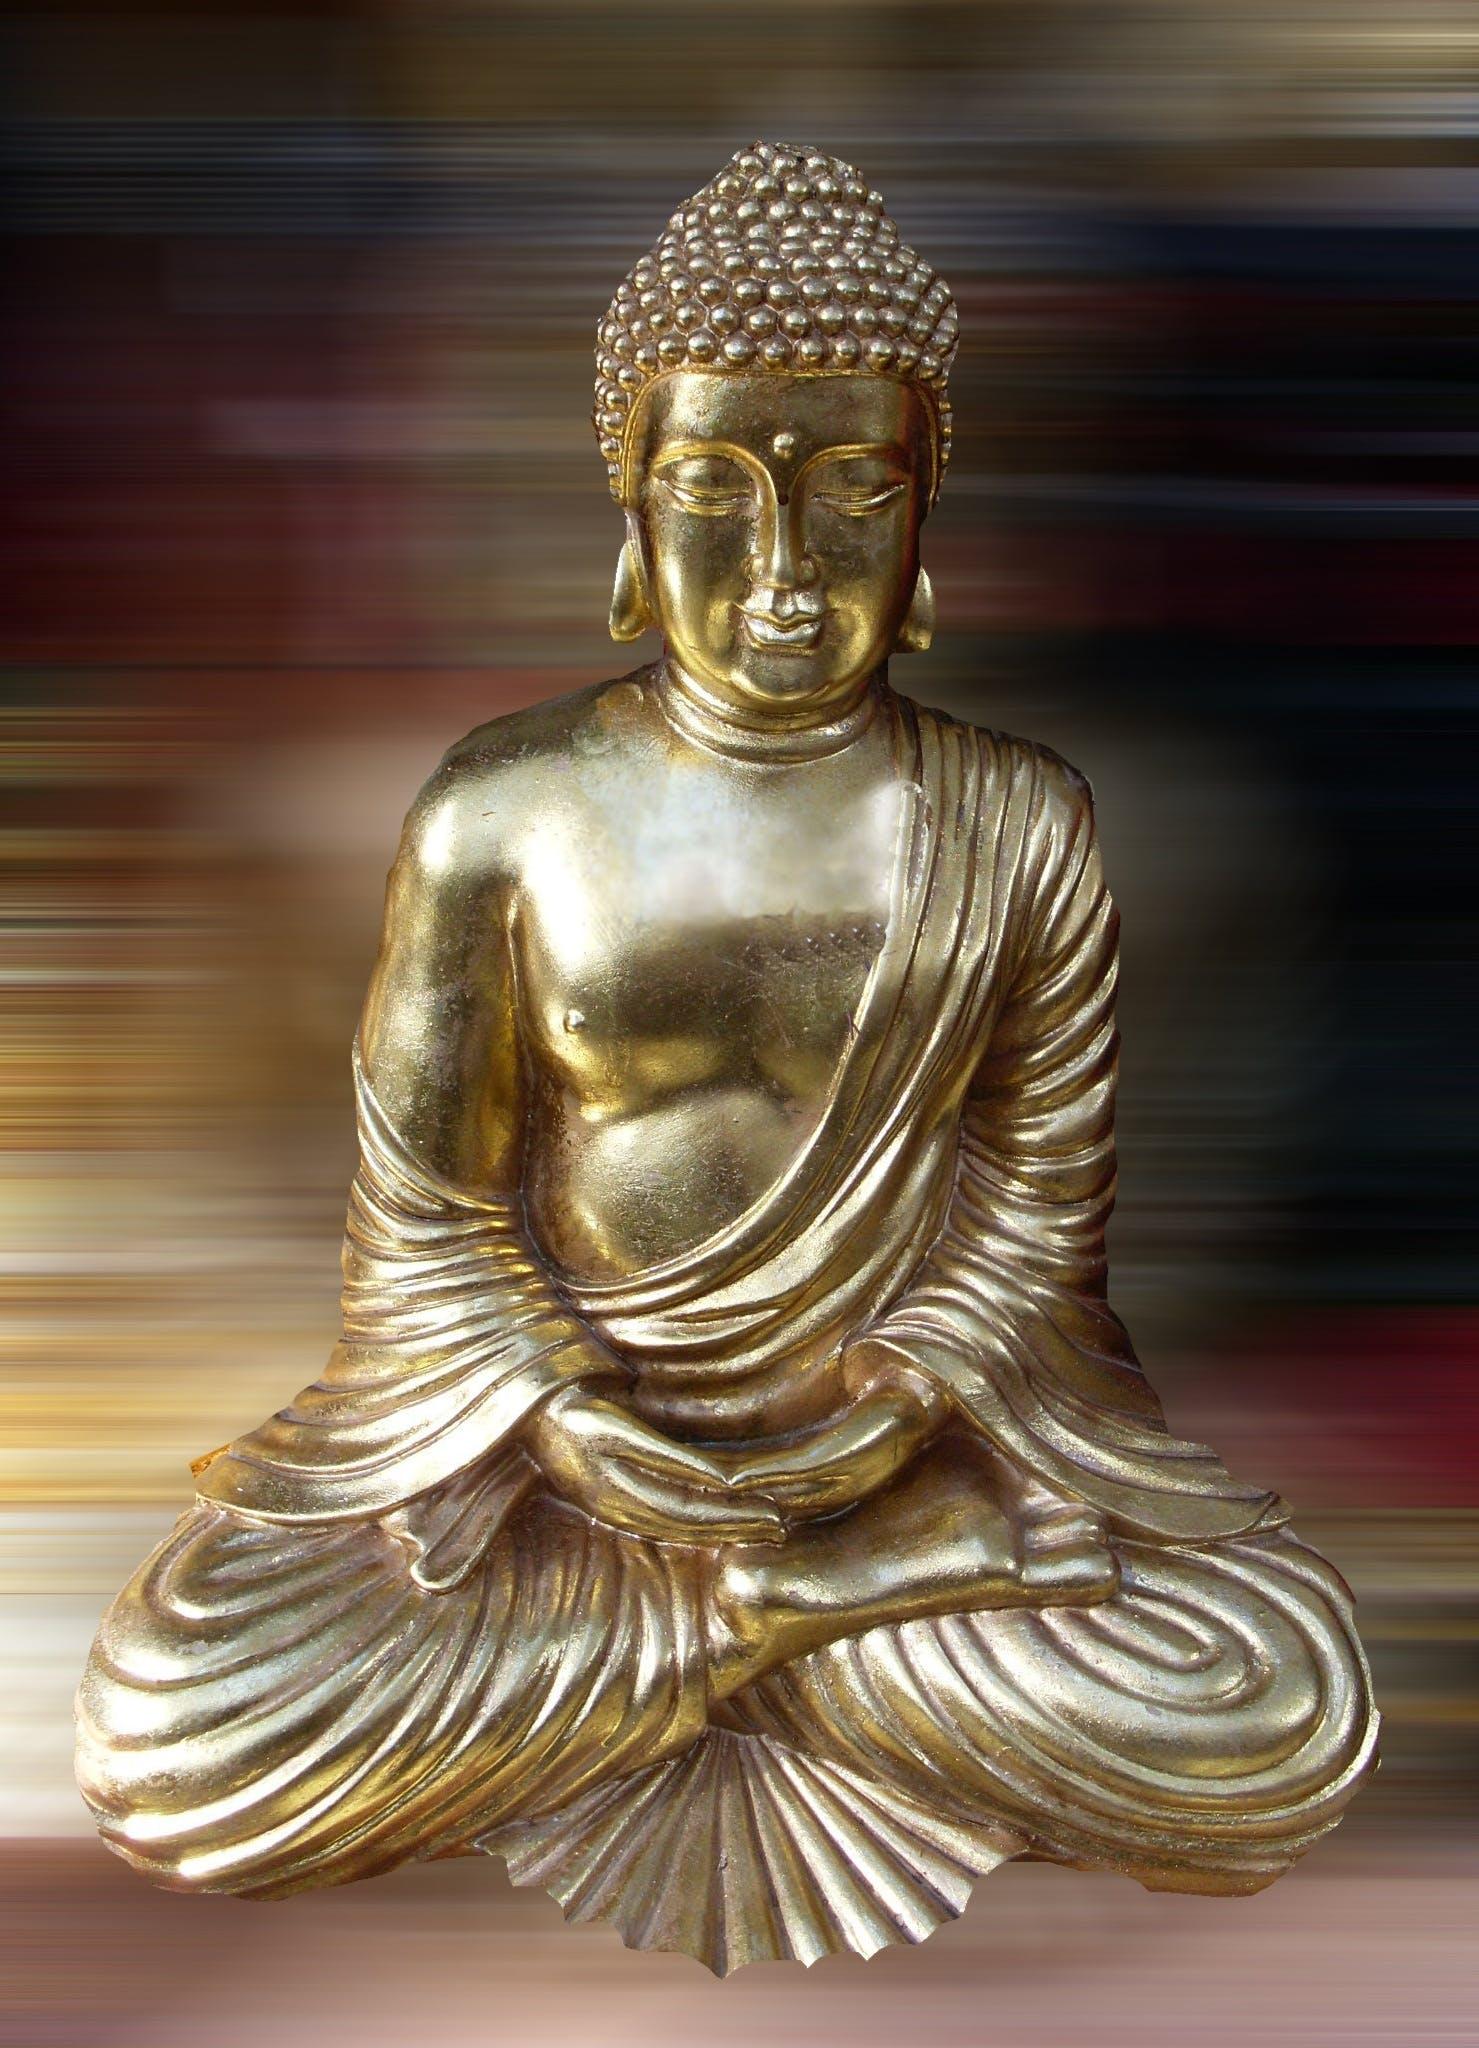 Free stock photo of art, statue, sculpture, buddha